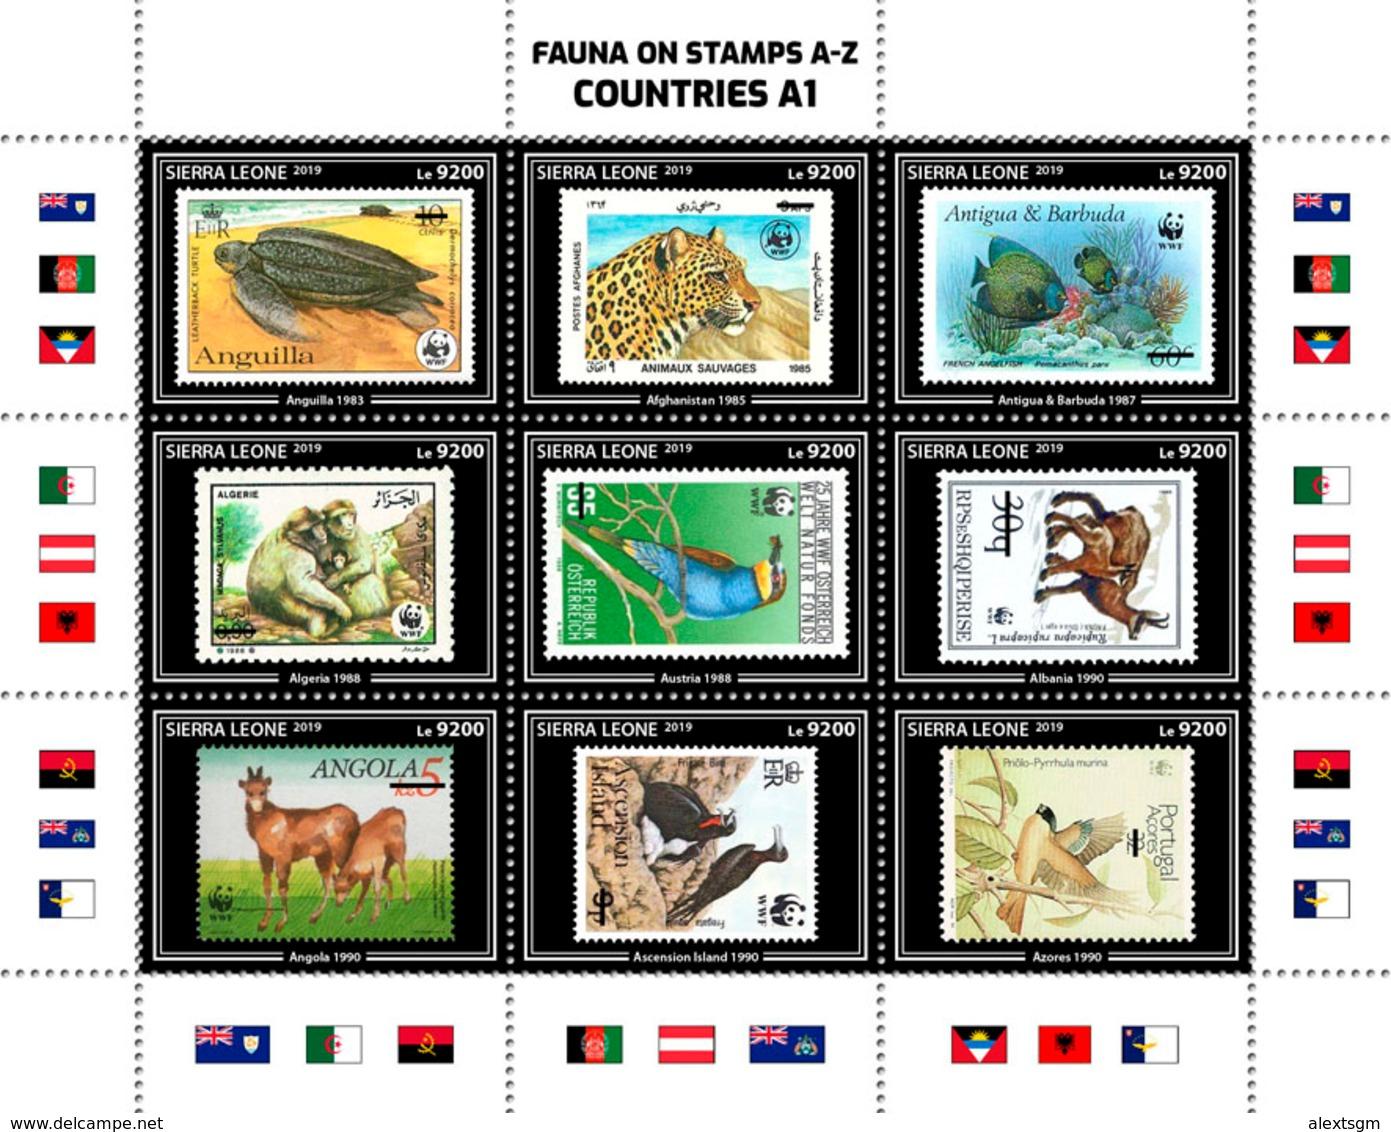 SIERRA LEONE 2019 - Leopard, Fauna On Stamps A1. Official Issue. - Roofkatten